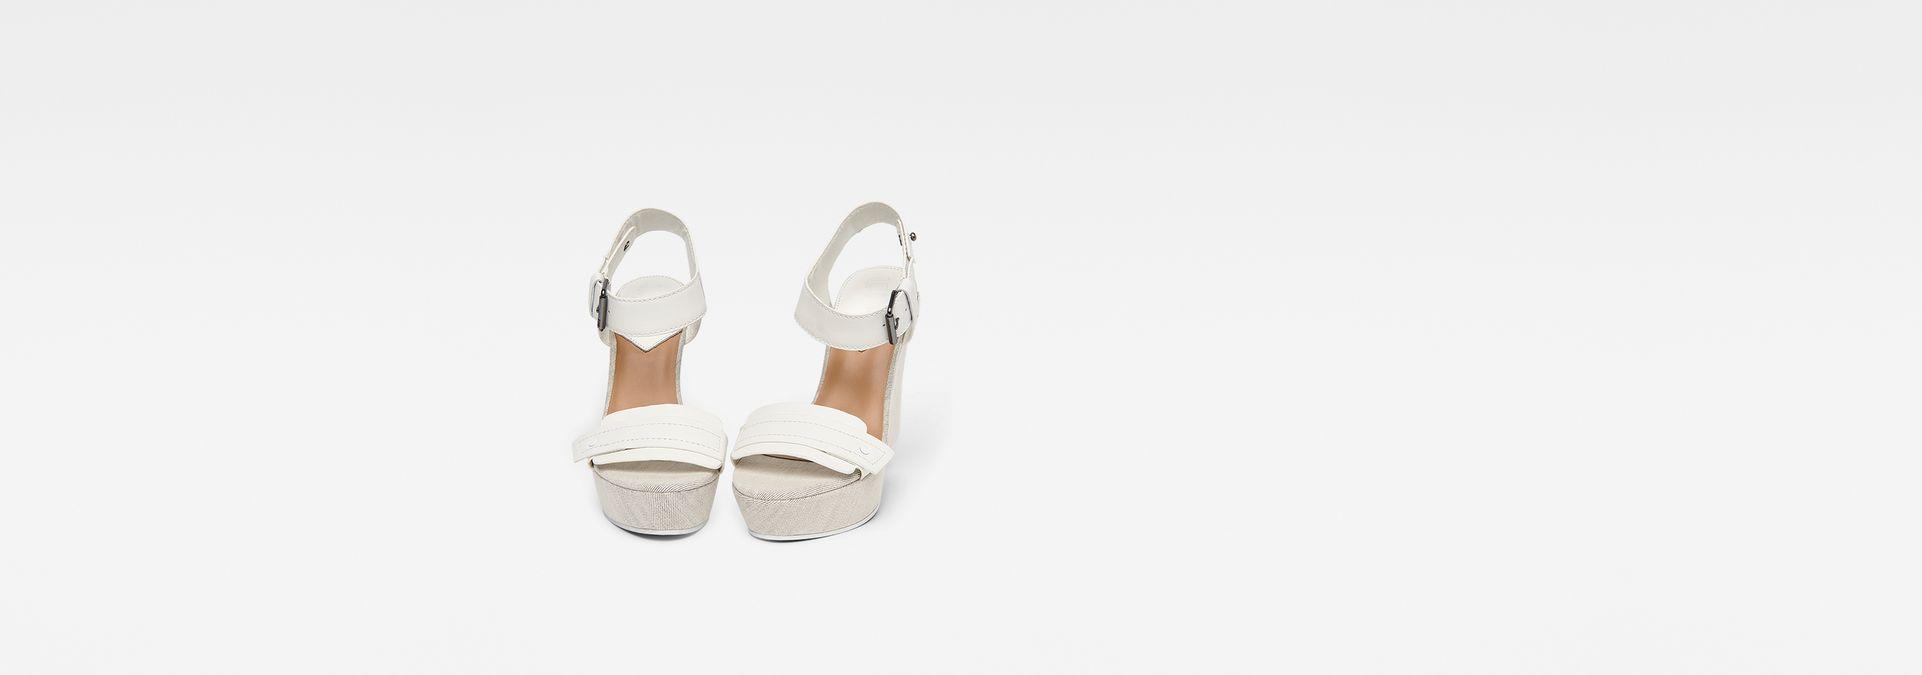 Femmes Star Wedge SandalsWhite Raw® G Claro N8ny0Ovmw